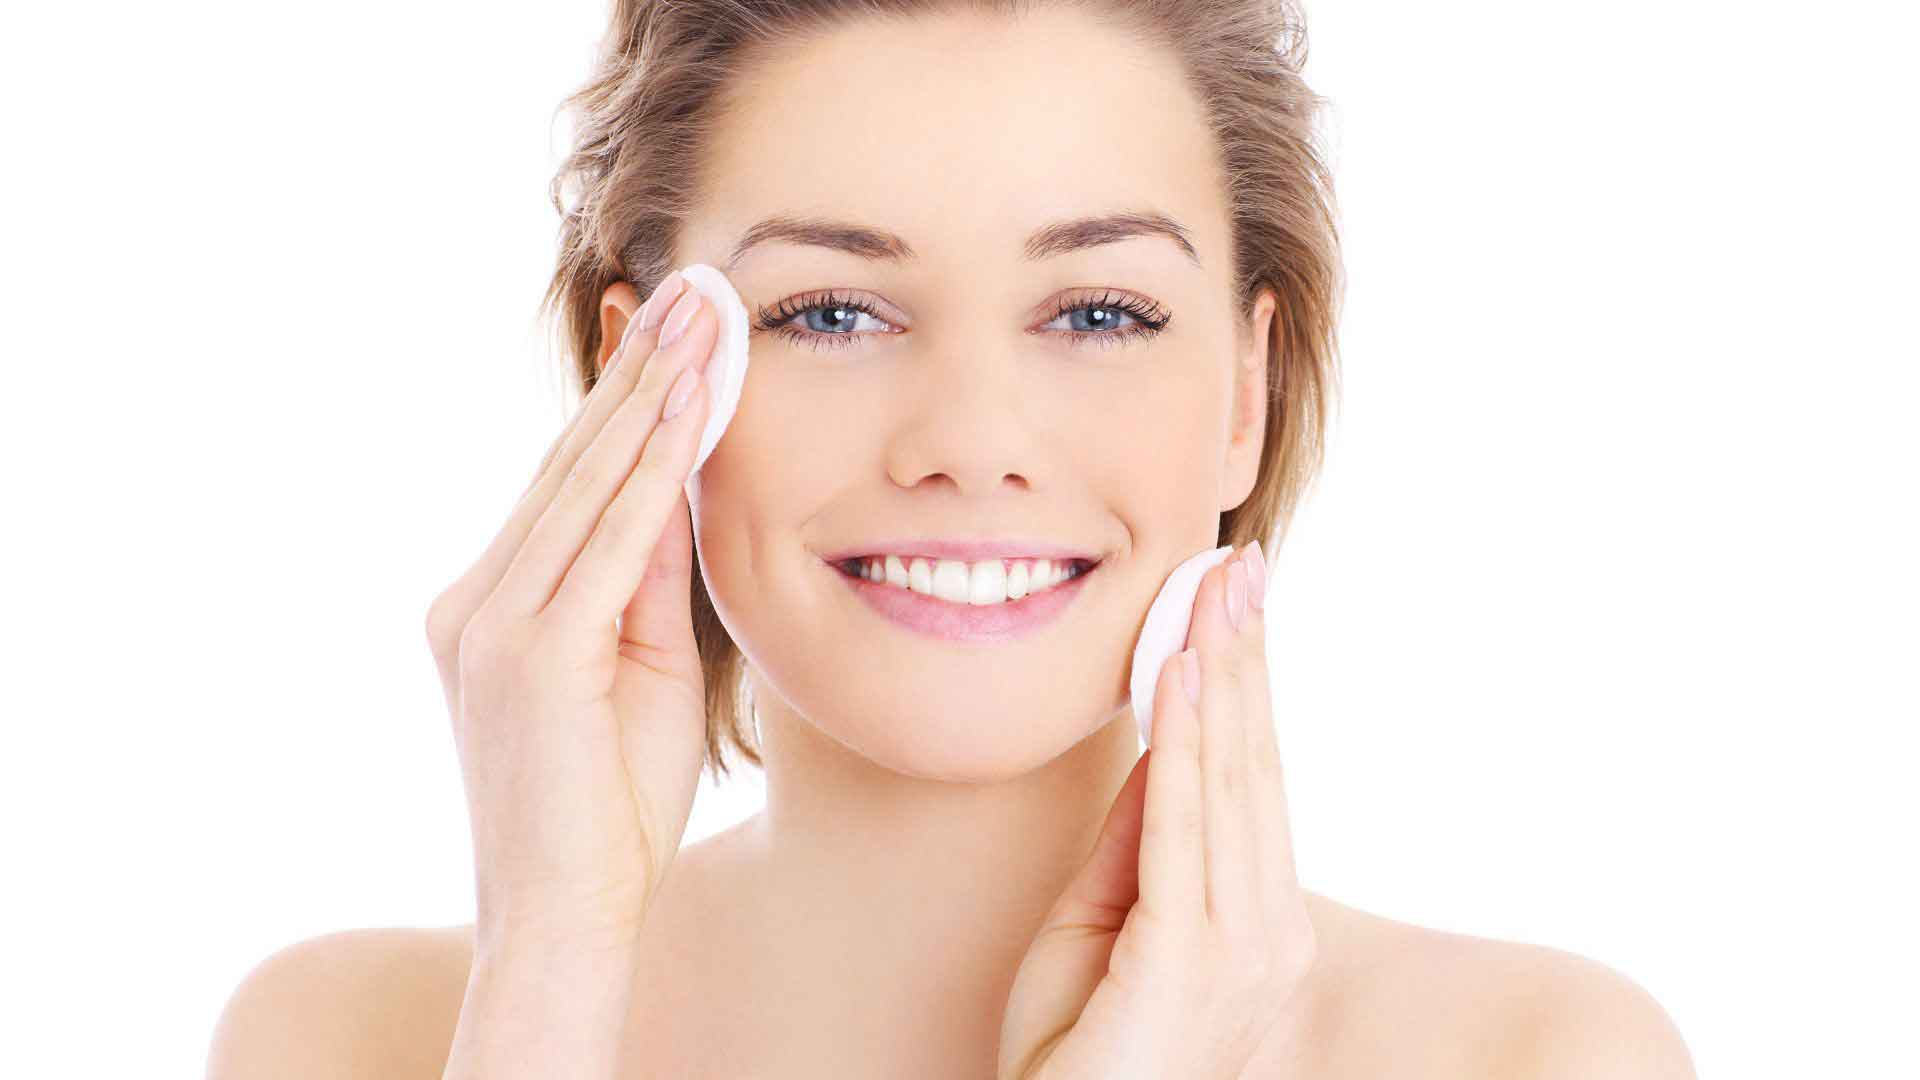 manfaat keuntungan wajah berminyak - posciety